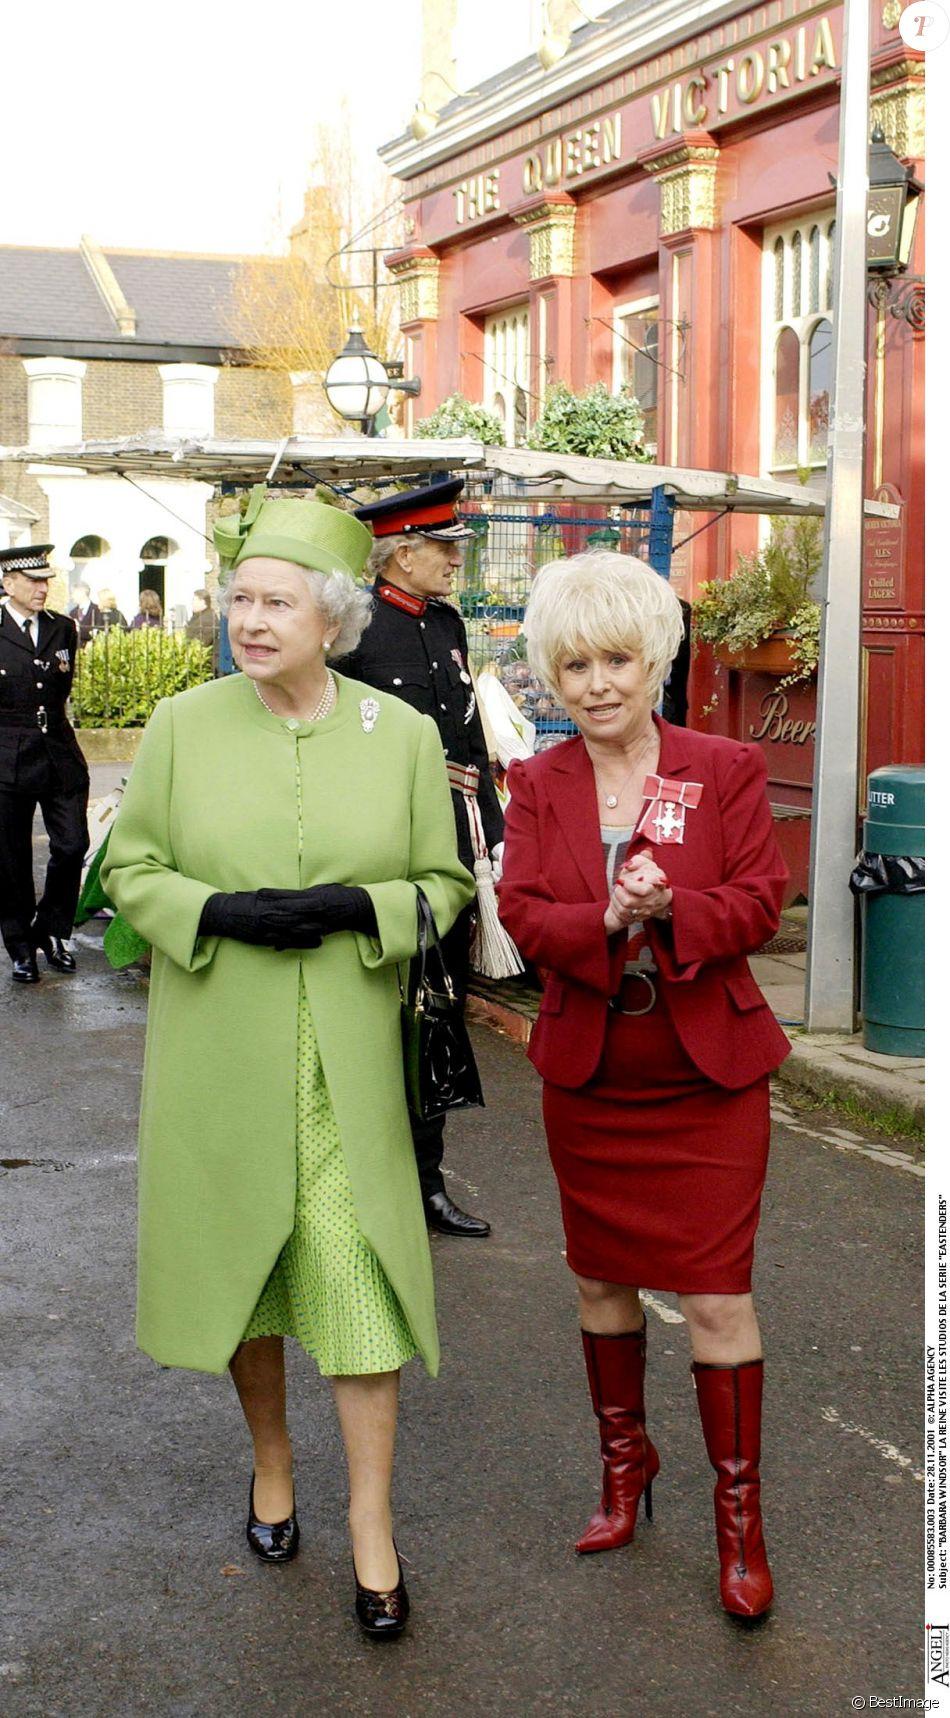 Barbara Windsor En Tailleur Rouge Recevant La Visite De Reine Elizabeth II Et